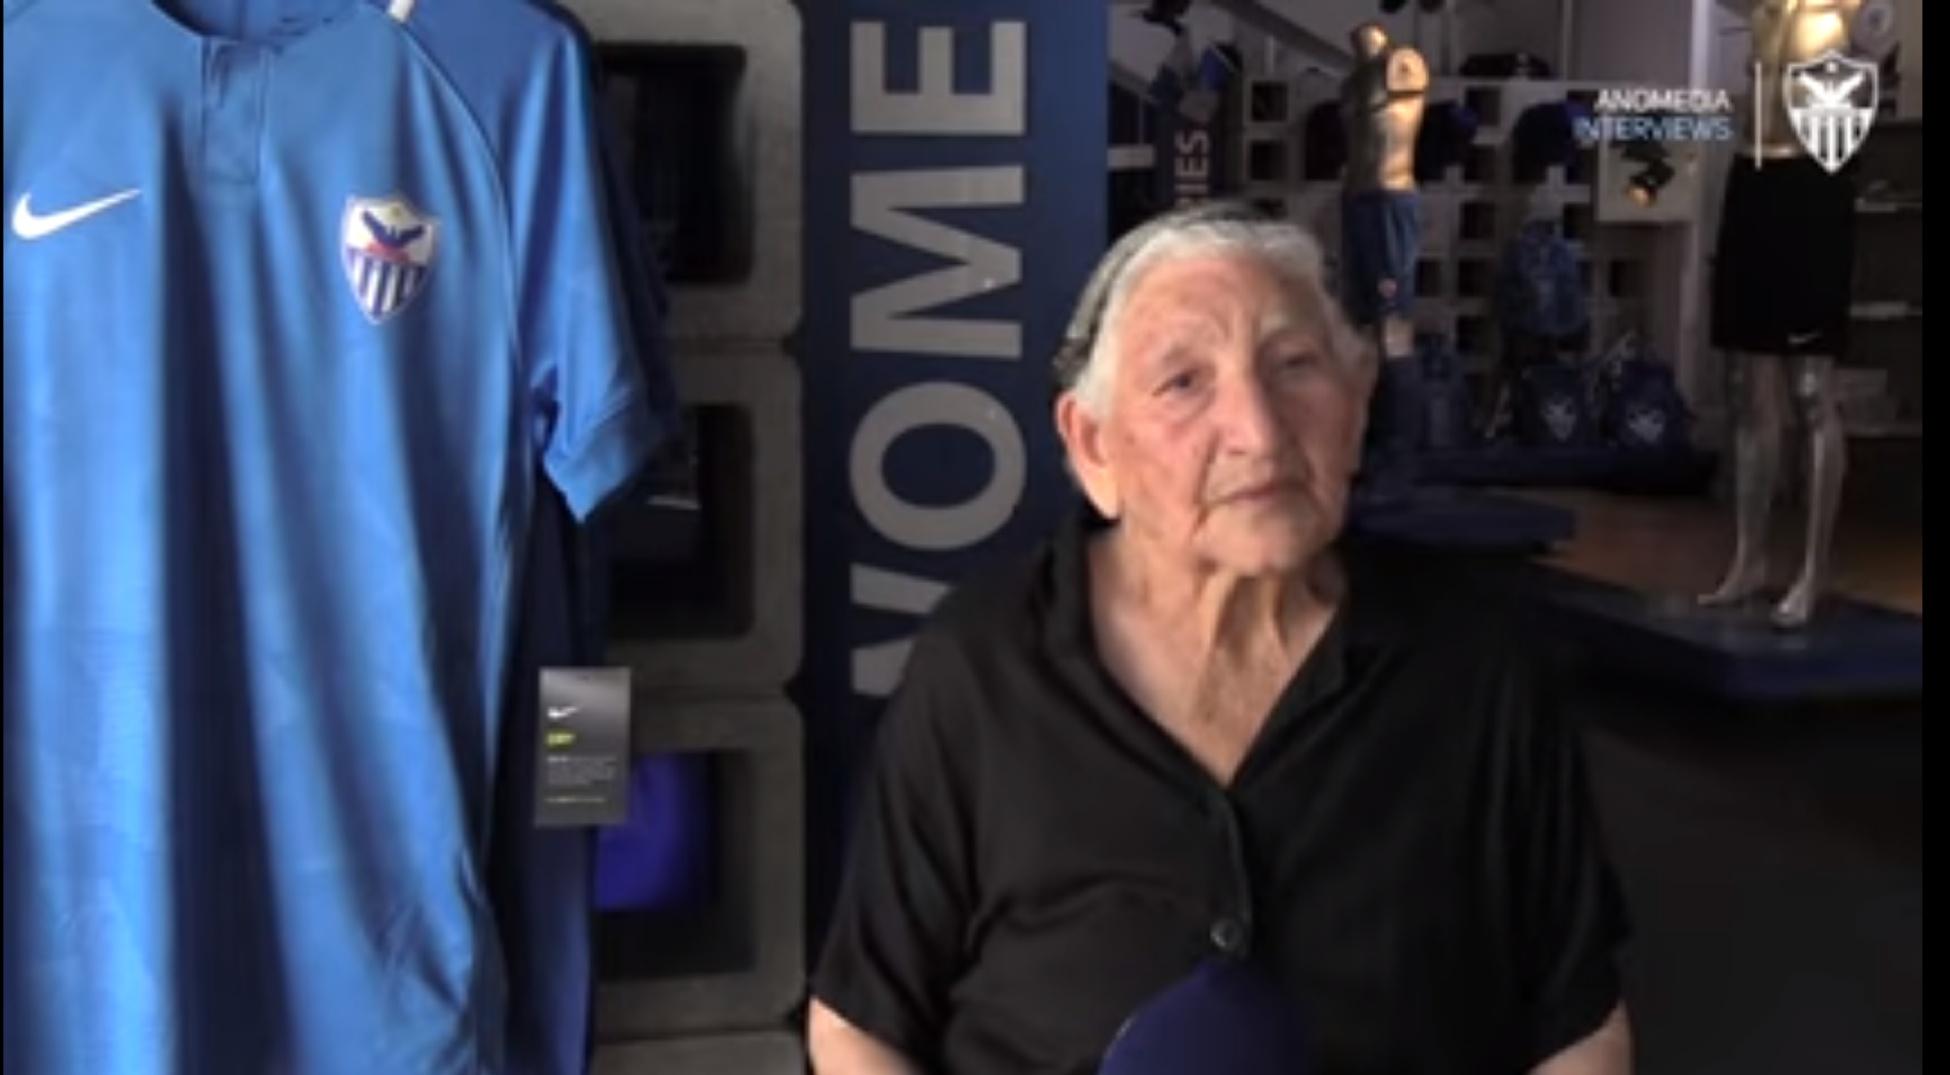 VIRAL: Η γιαγια Σταυρούλα αγοράζει 5 διαρκείας για να τα δωρίσει σε άπορα παιδιά! (βίντεο)